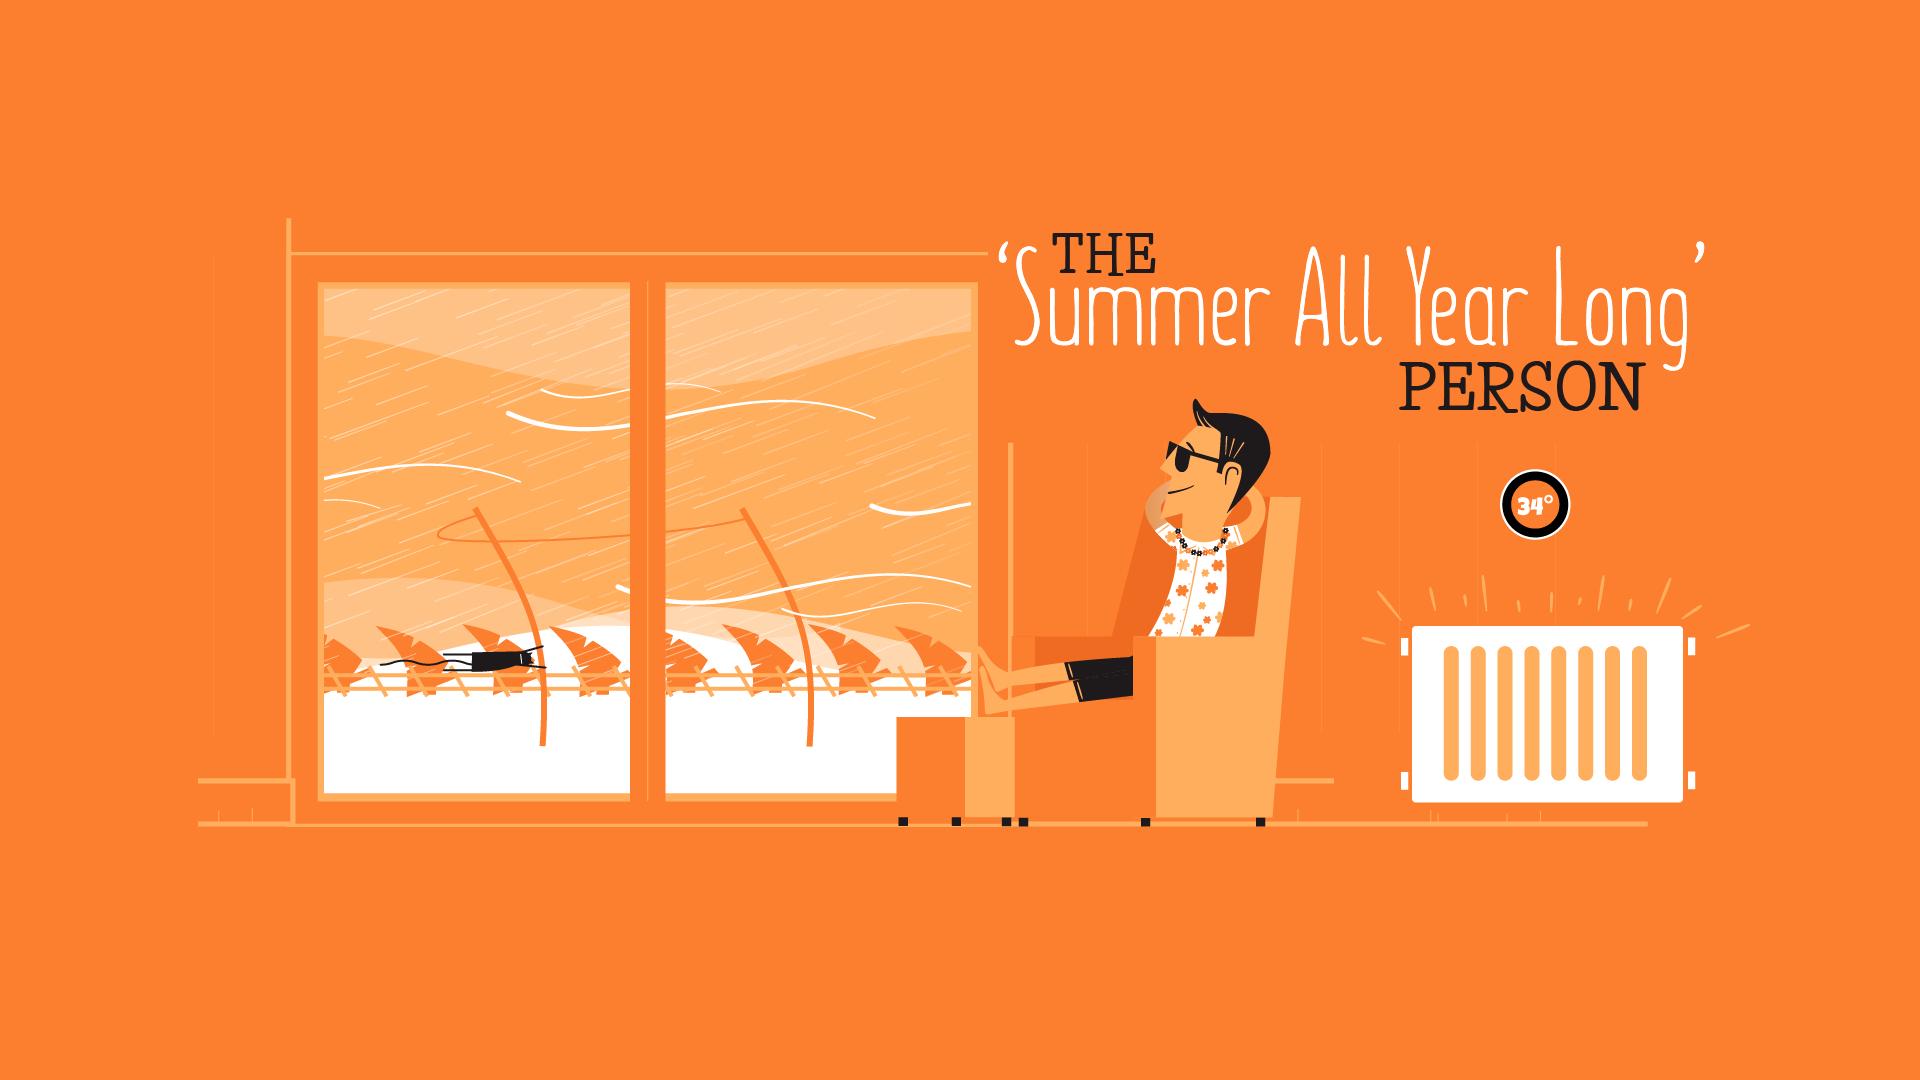 it's summer all year round